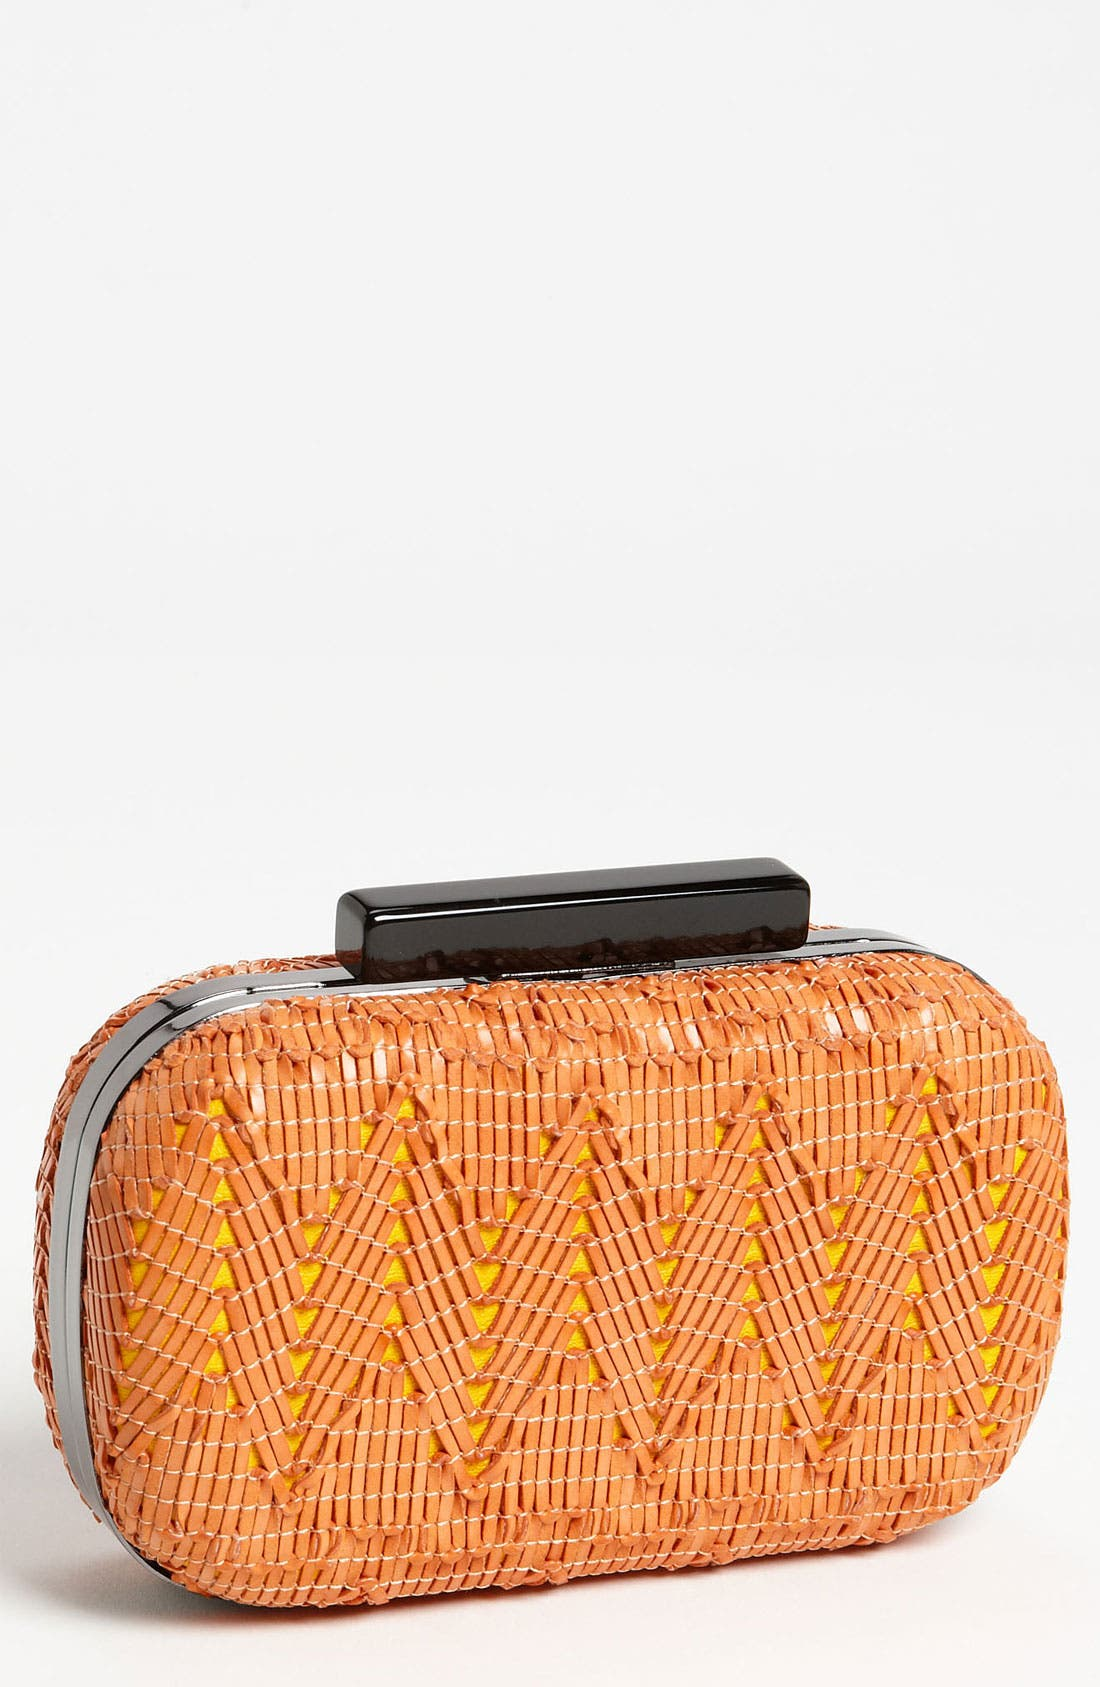 Main Image - Natasha Couture 'Basket Case' Clutch